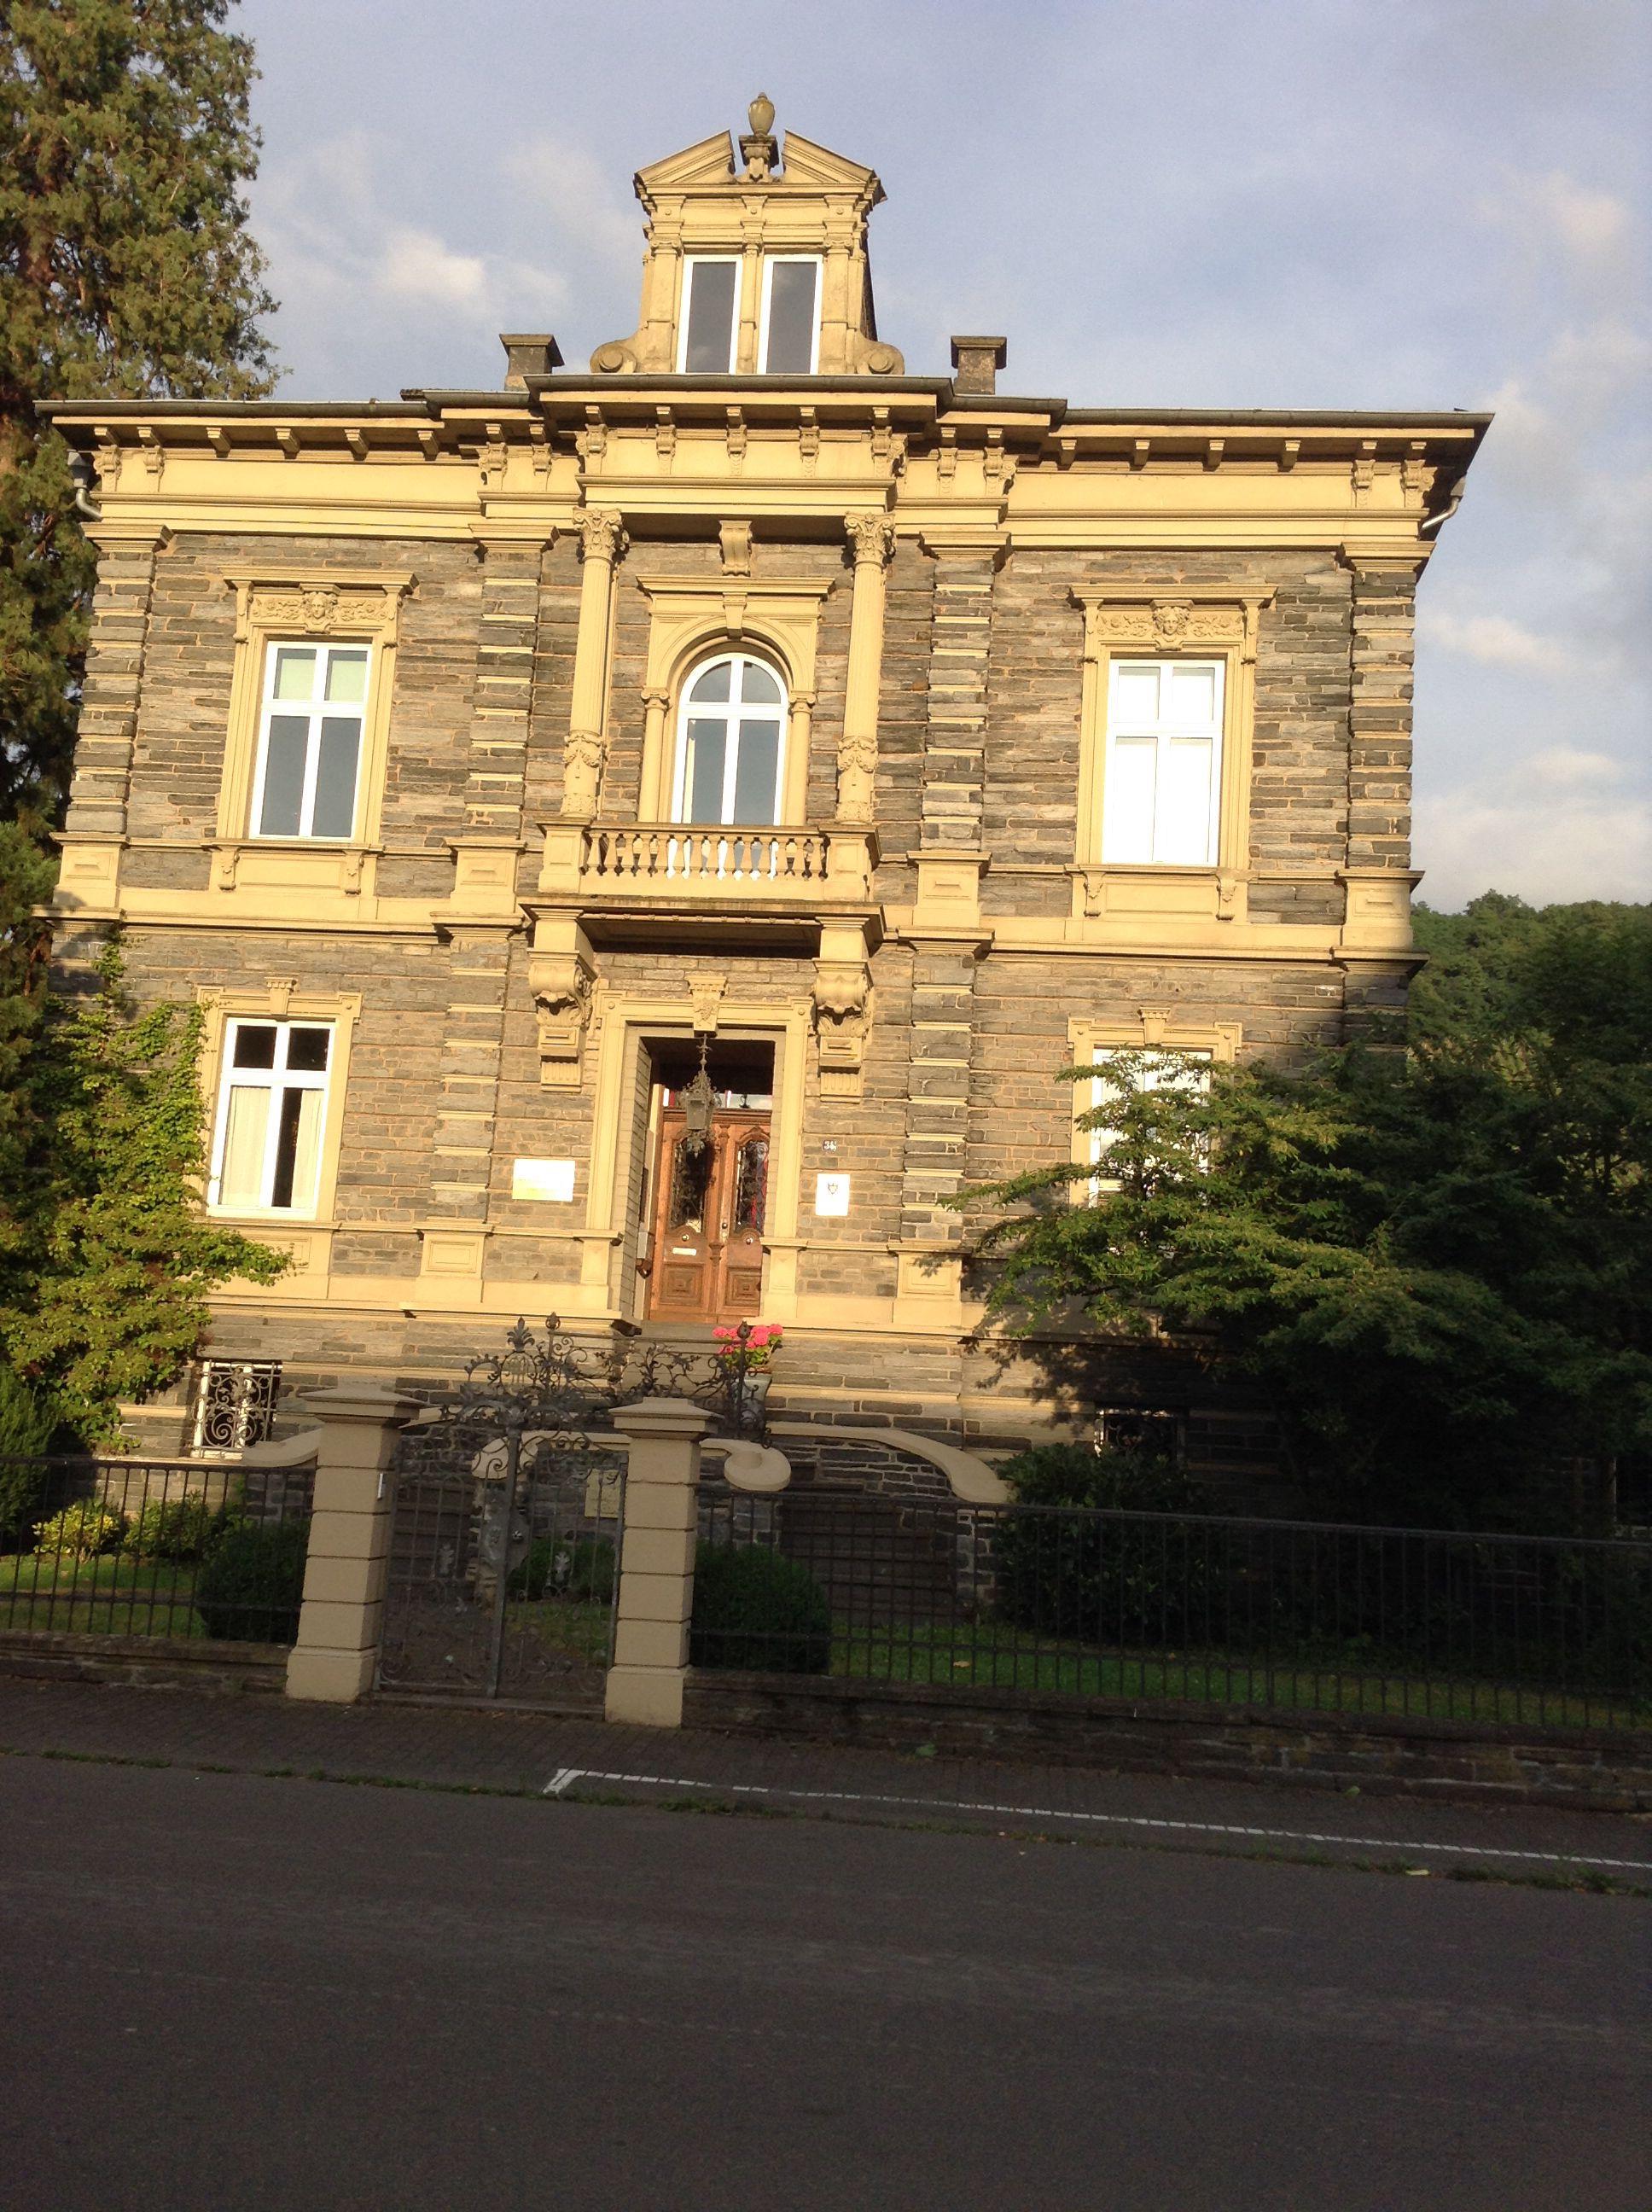 Germany, Bernkastel-Kues